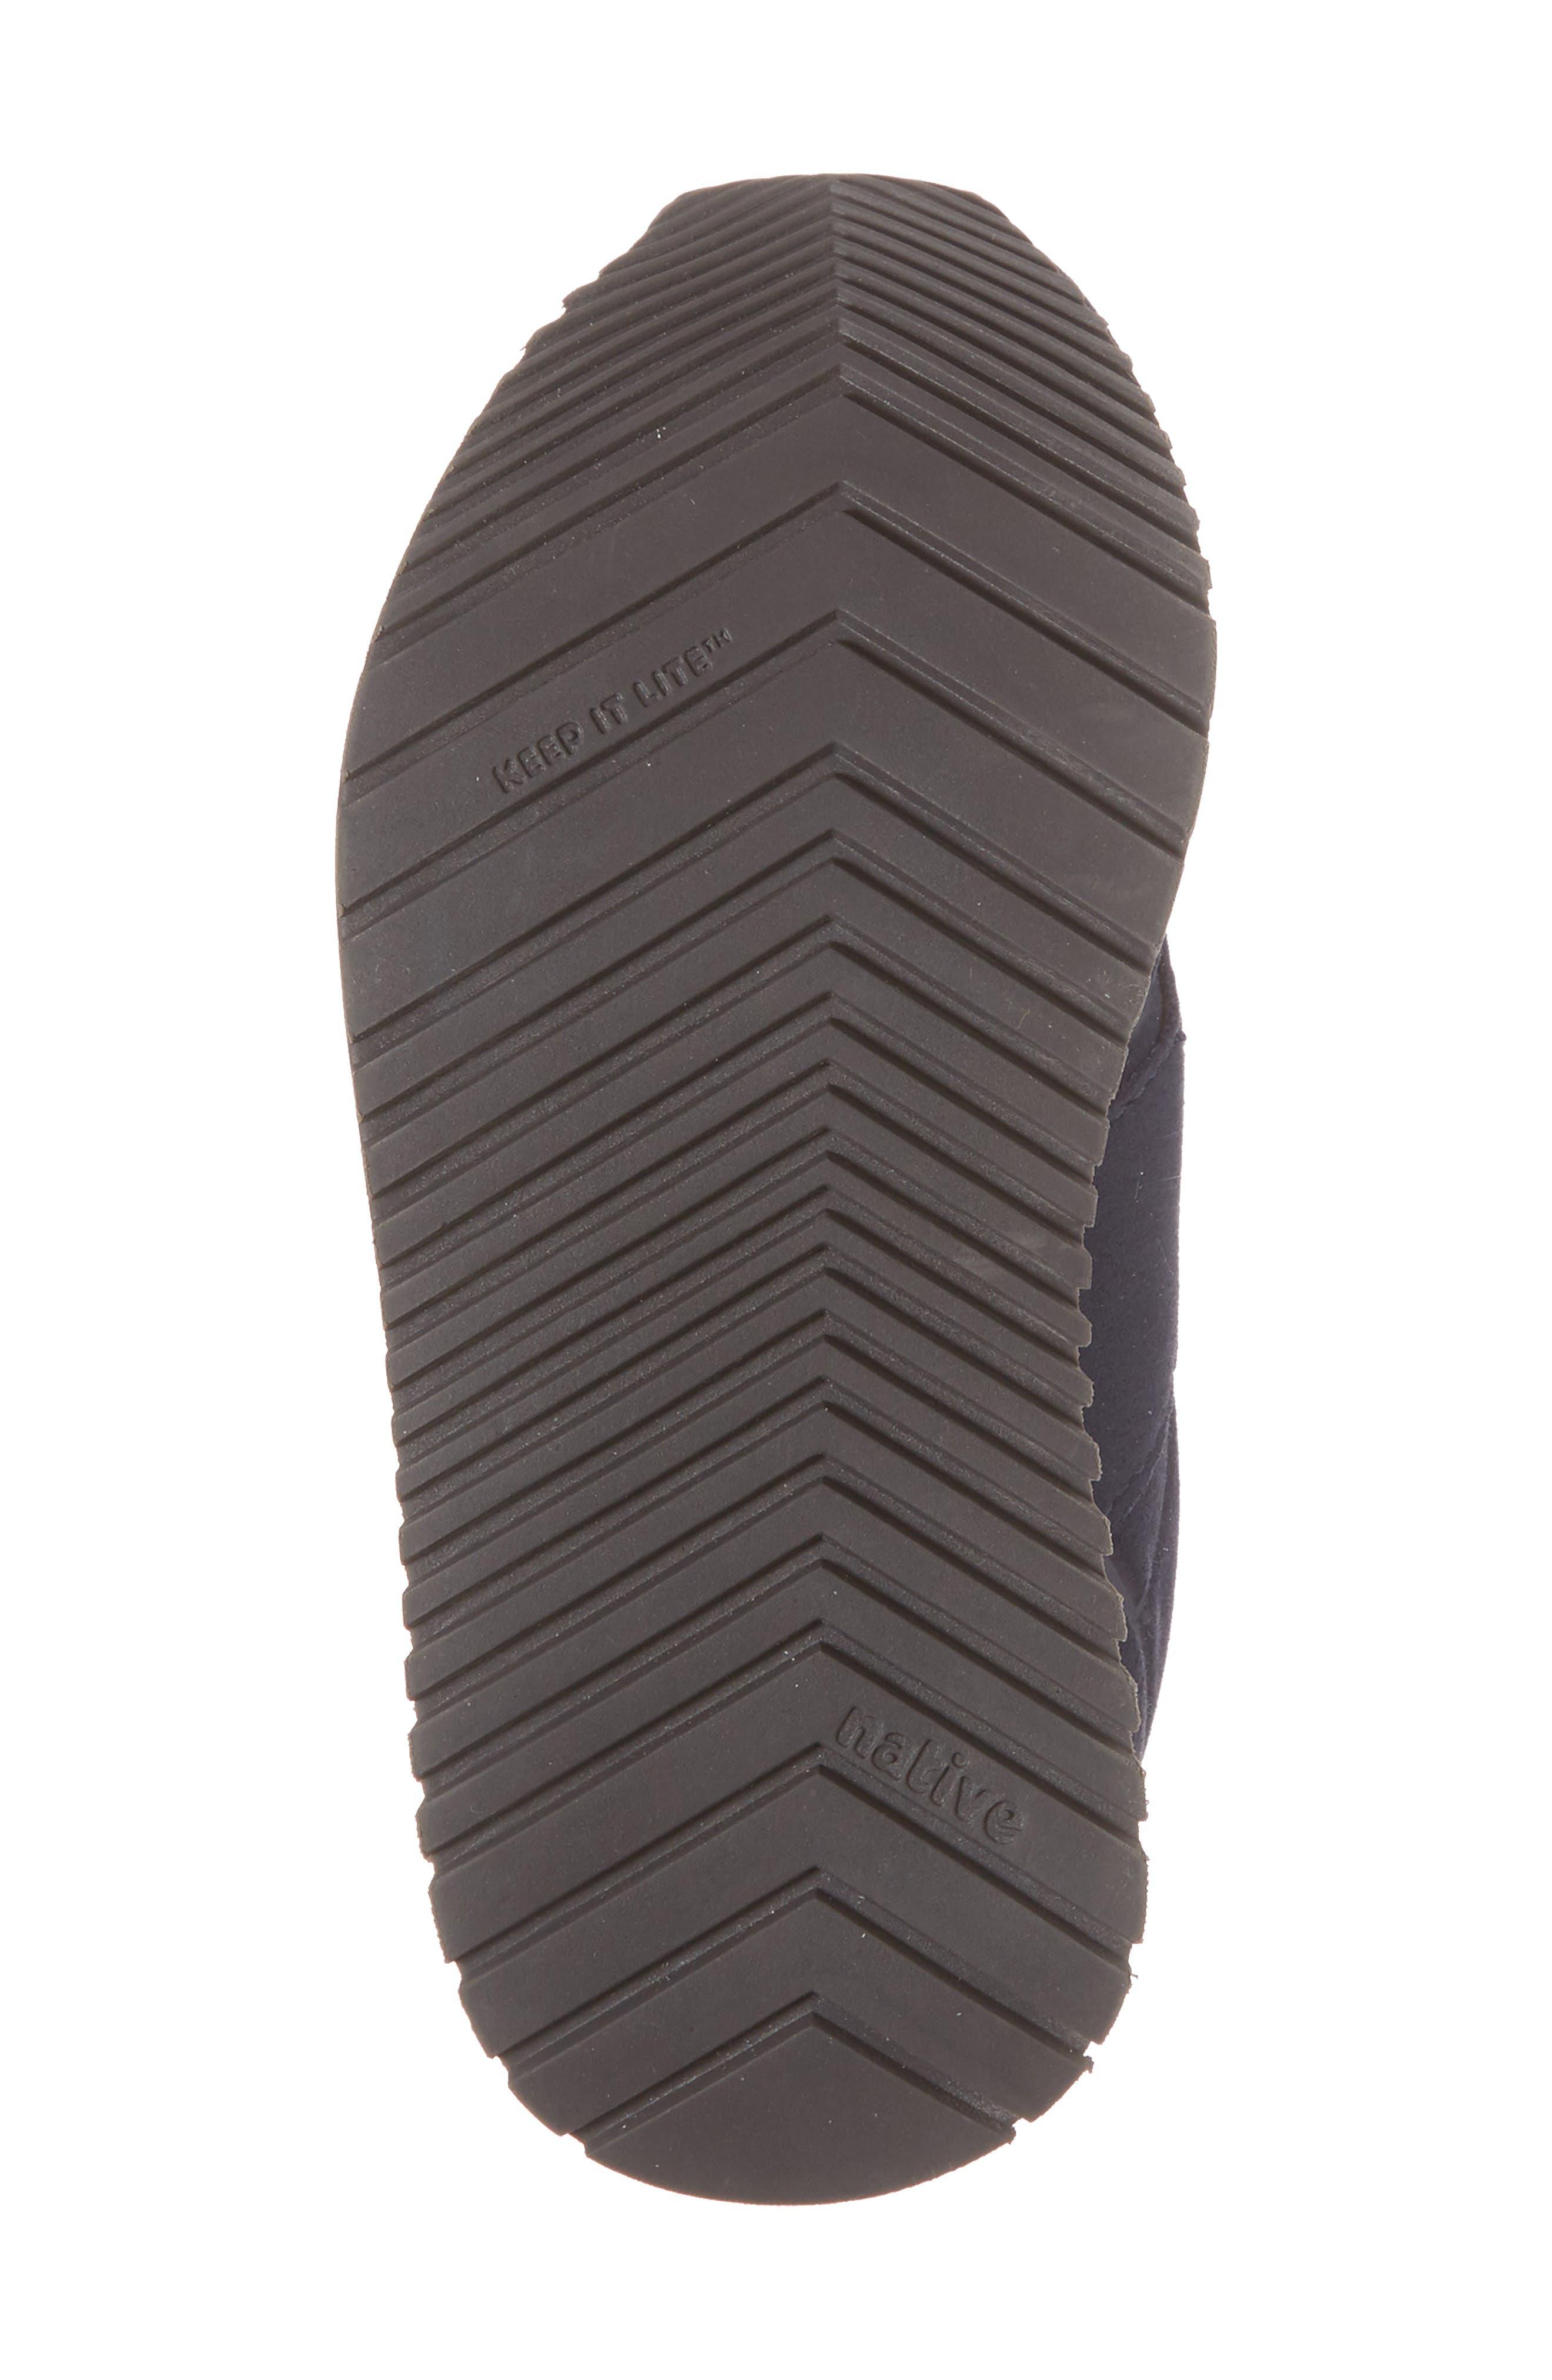 Native Cornell Perforated Sneaker,                             Alternate thumbnail 6, color,                             REGATTA BLUE/ SHELL WHITE